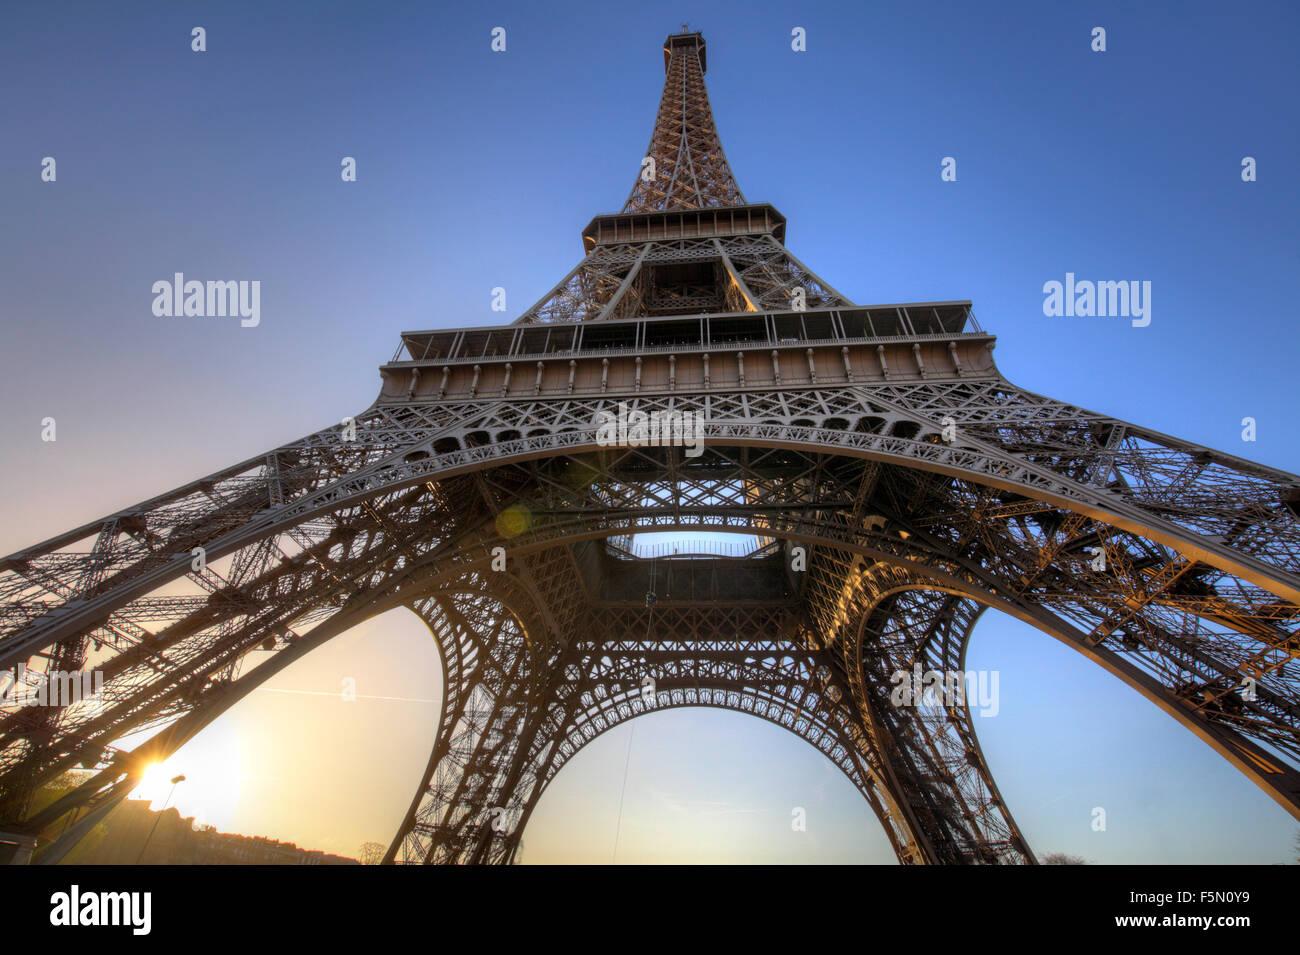 Eiffel Tower at sunrise, Paris, France - Stock Image